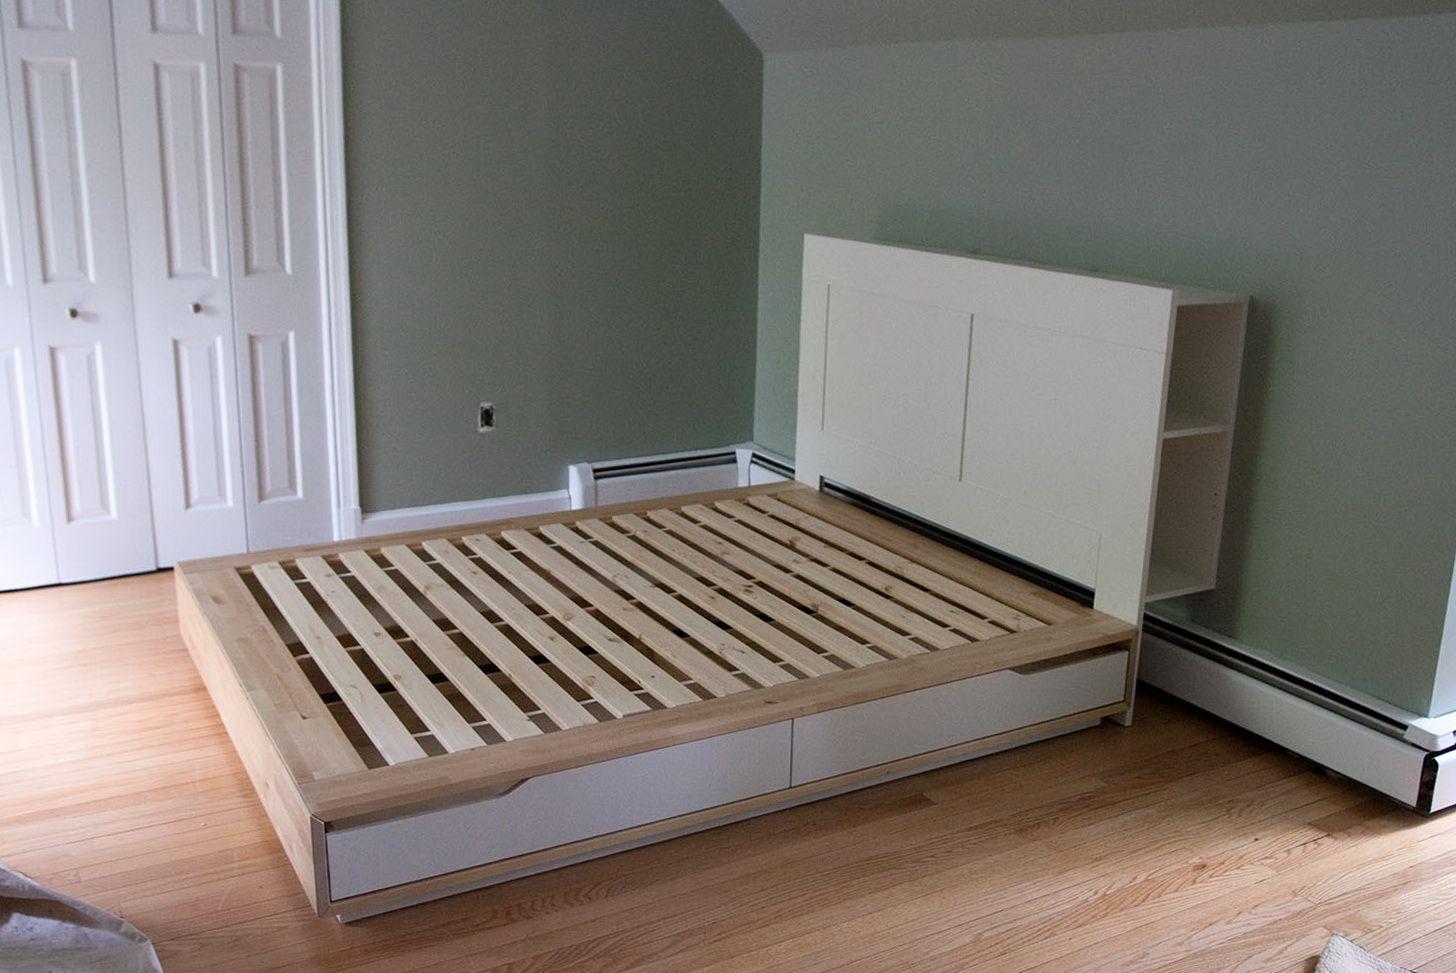 Bed Sample Lit Rangement Tete De Lit Rangement